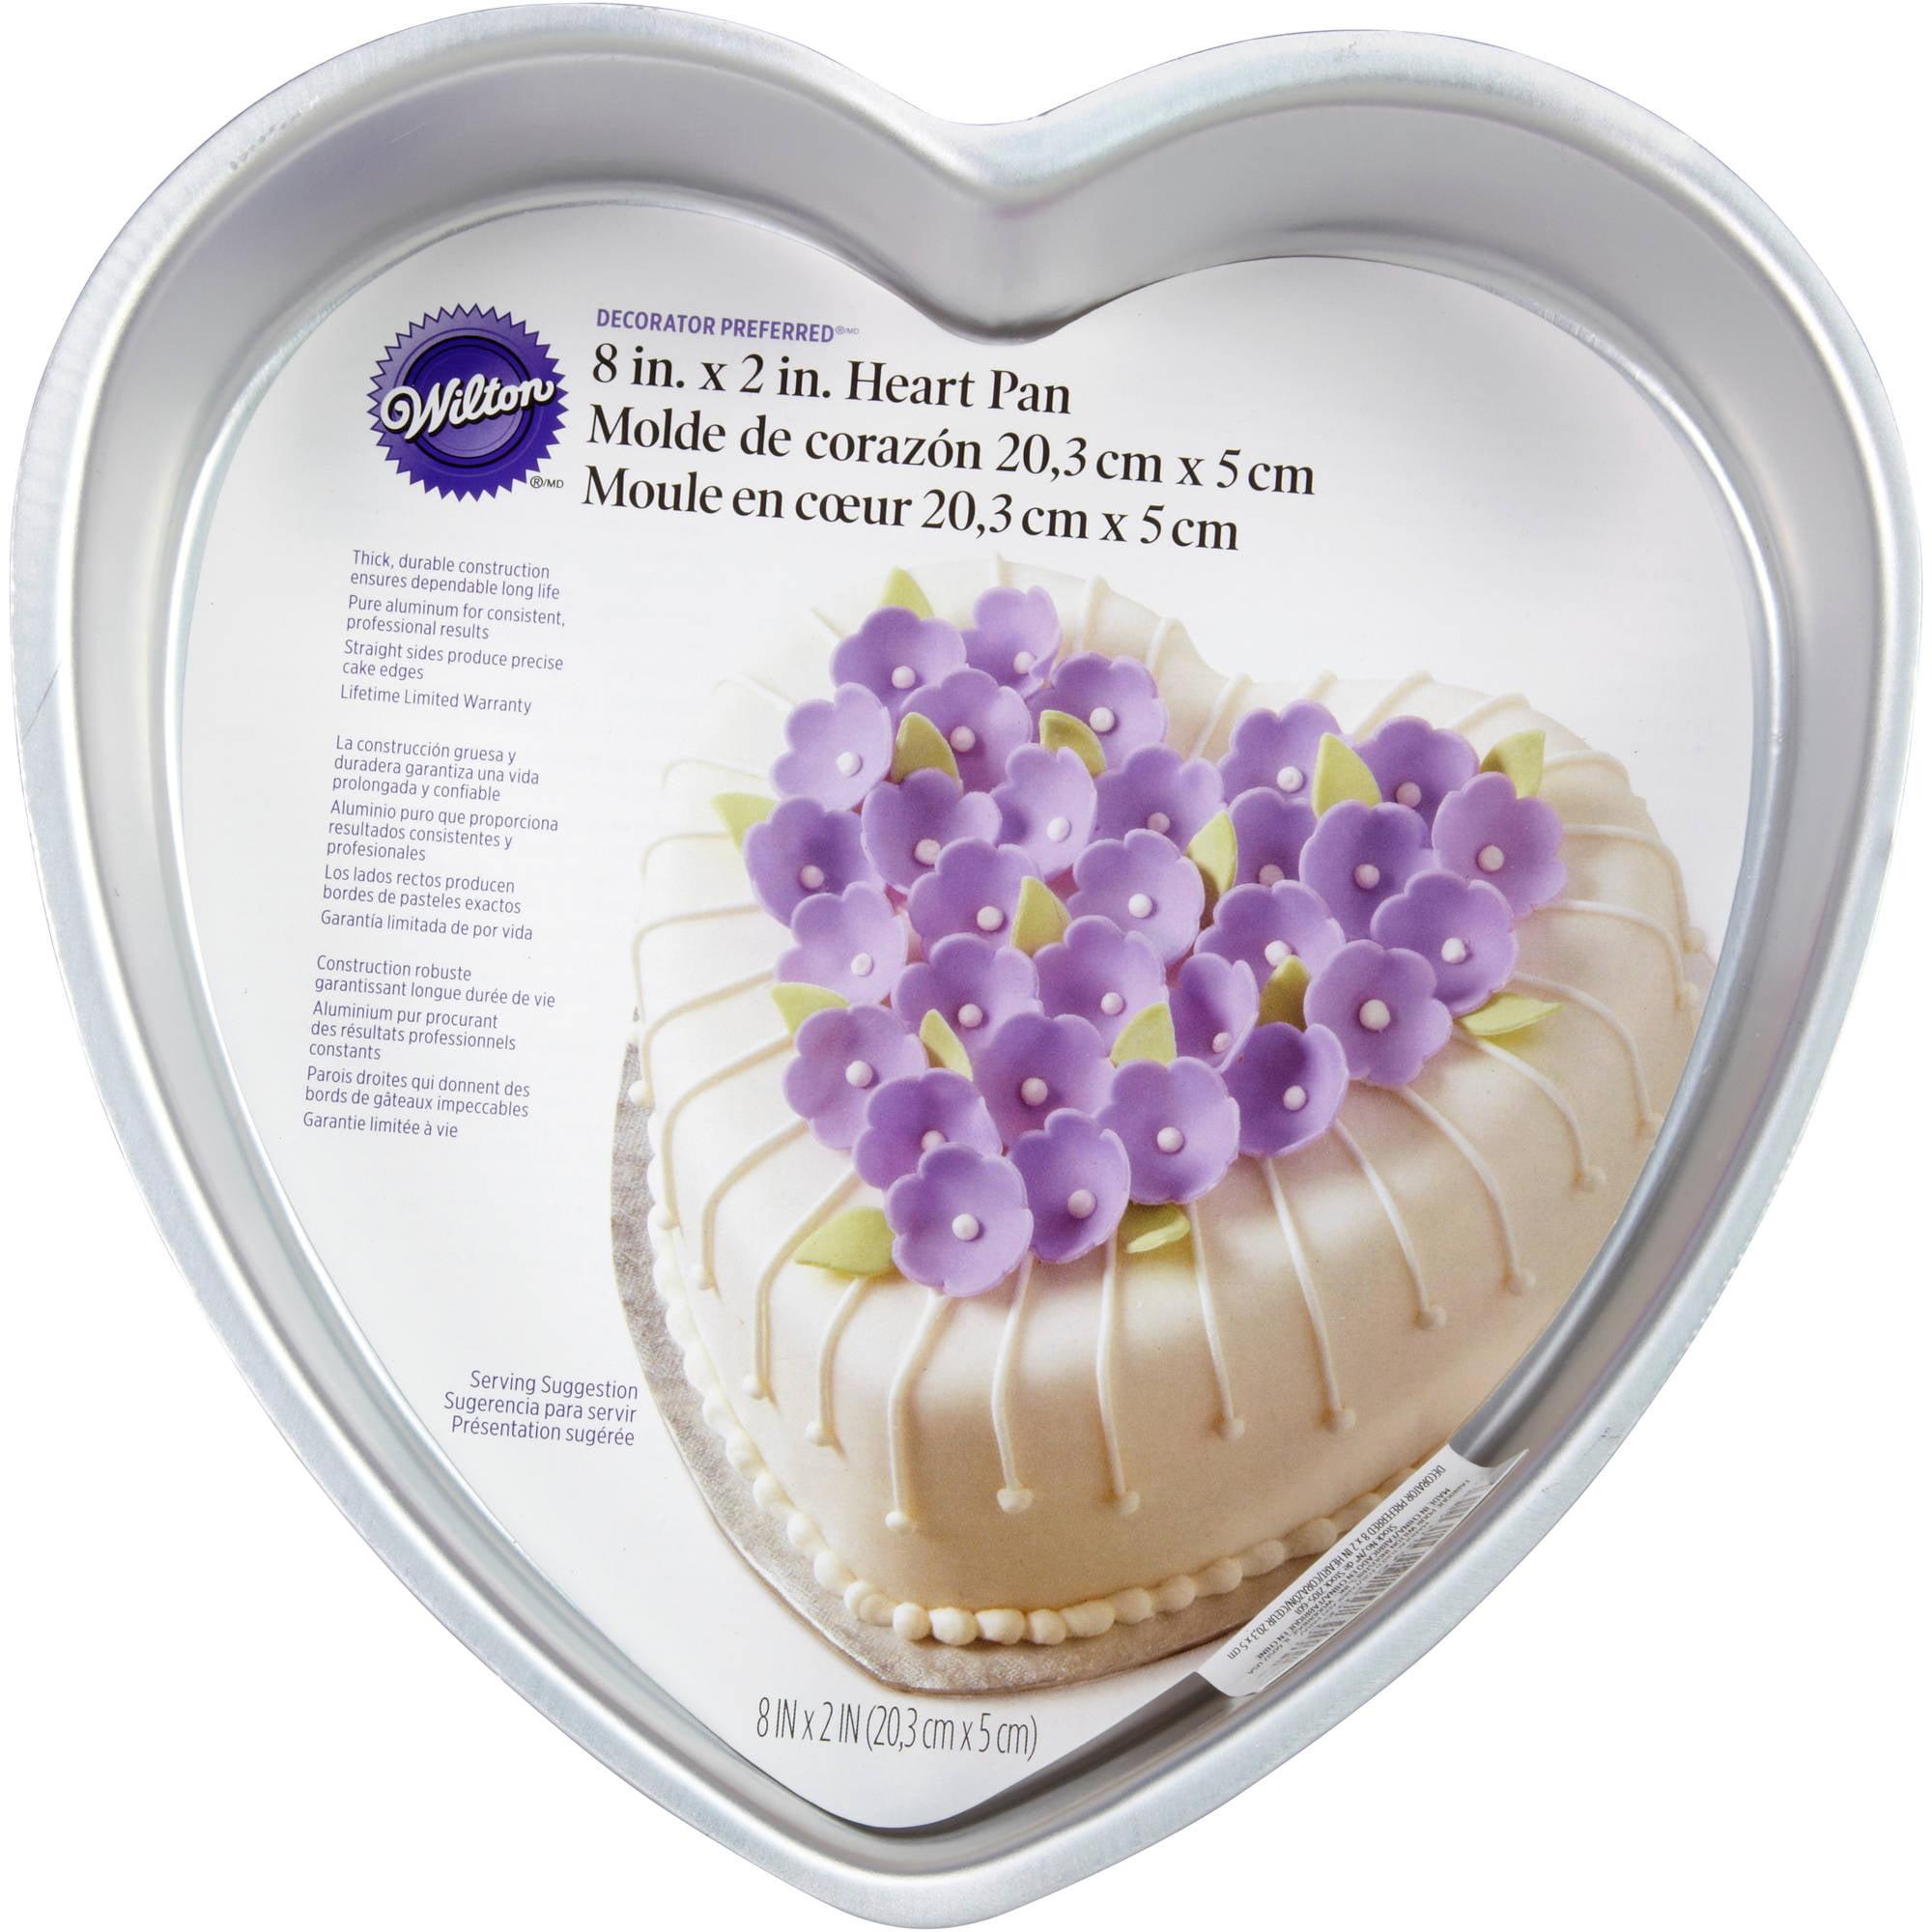 "Wilton Decorator Preferred 8"" Cake Pan, Heart 2105-601"